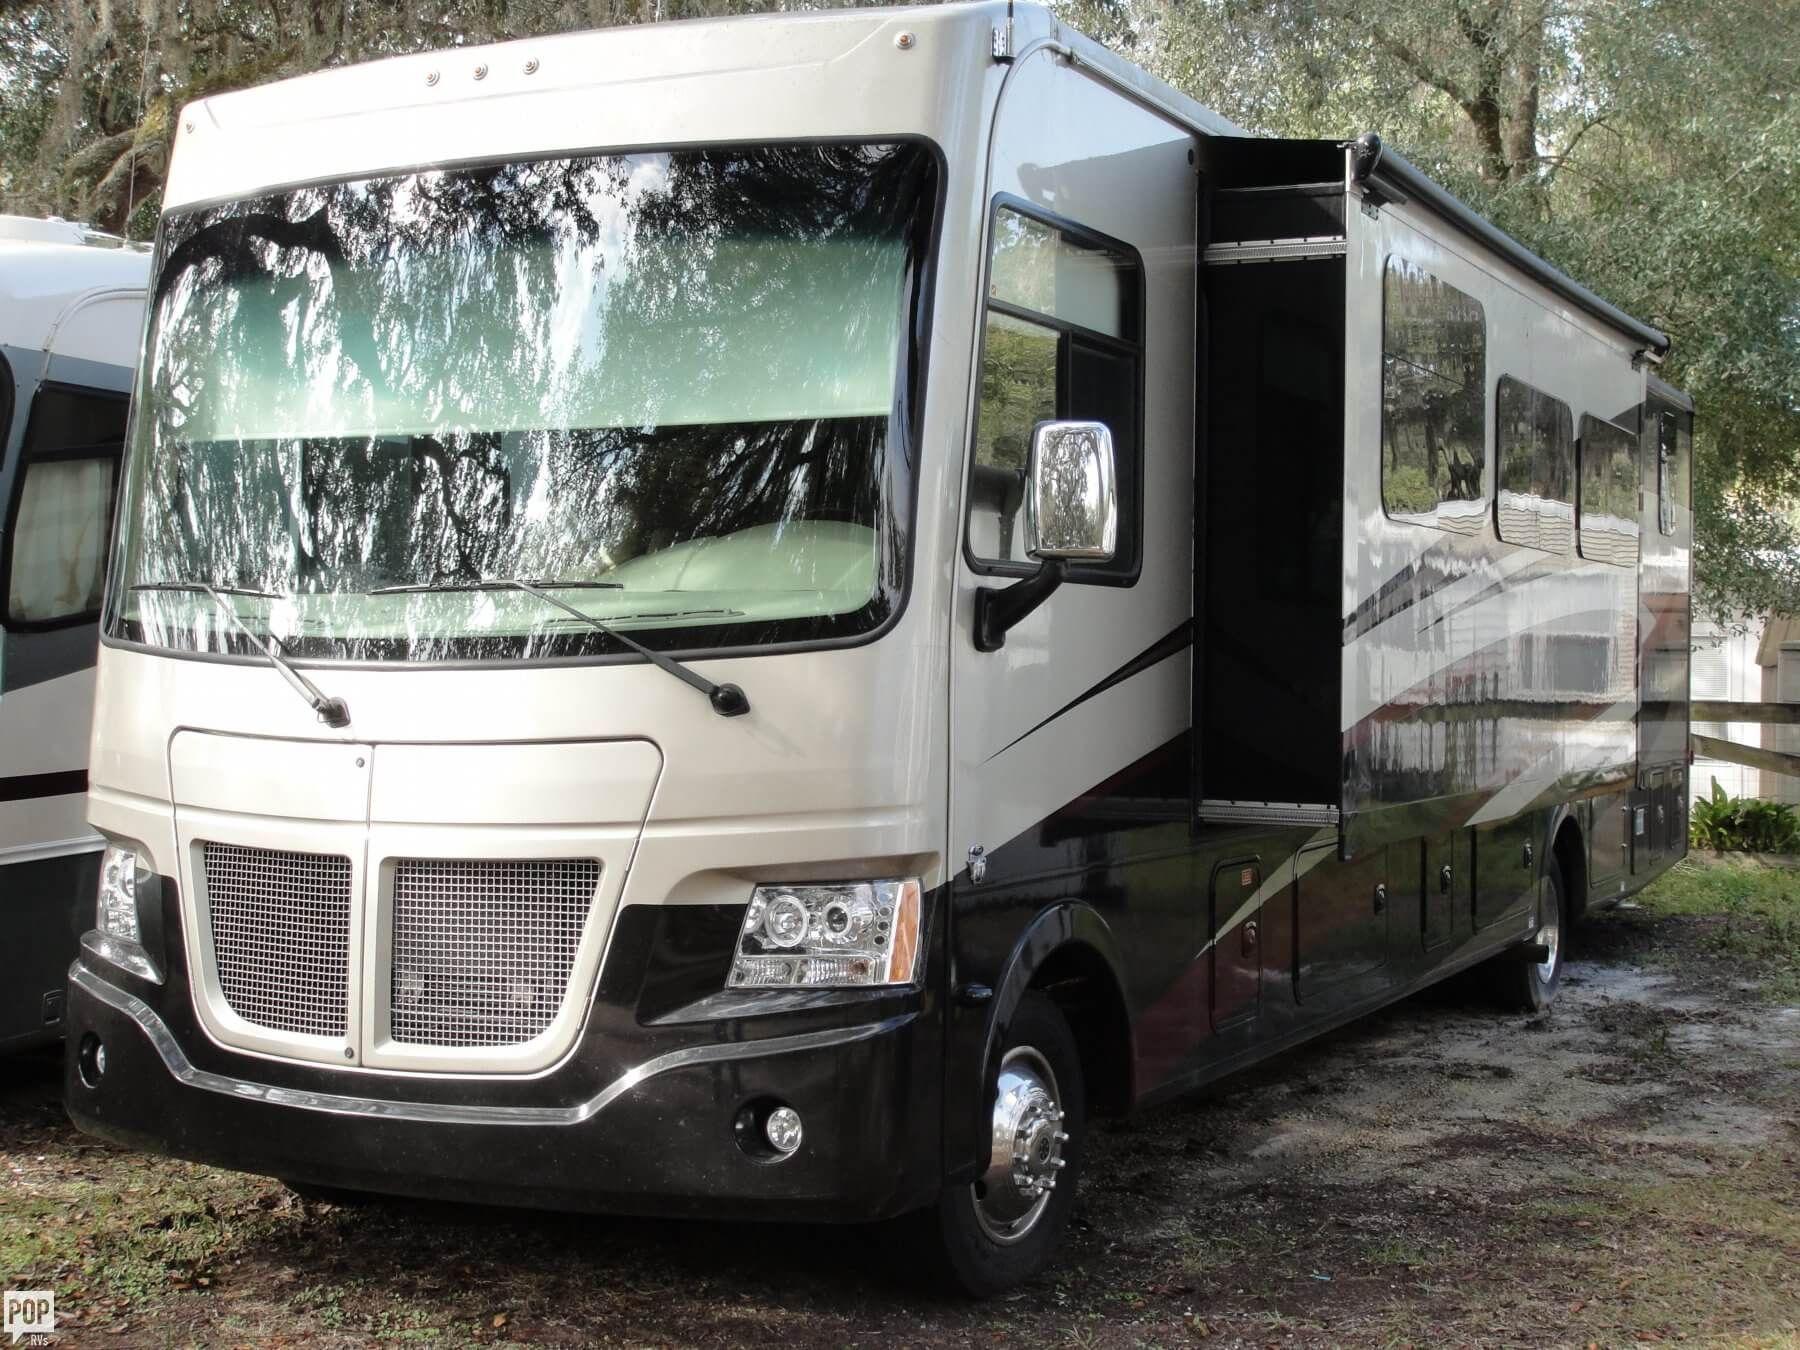 2015 coachman mirada 35ls low miles original owner